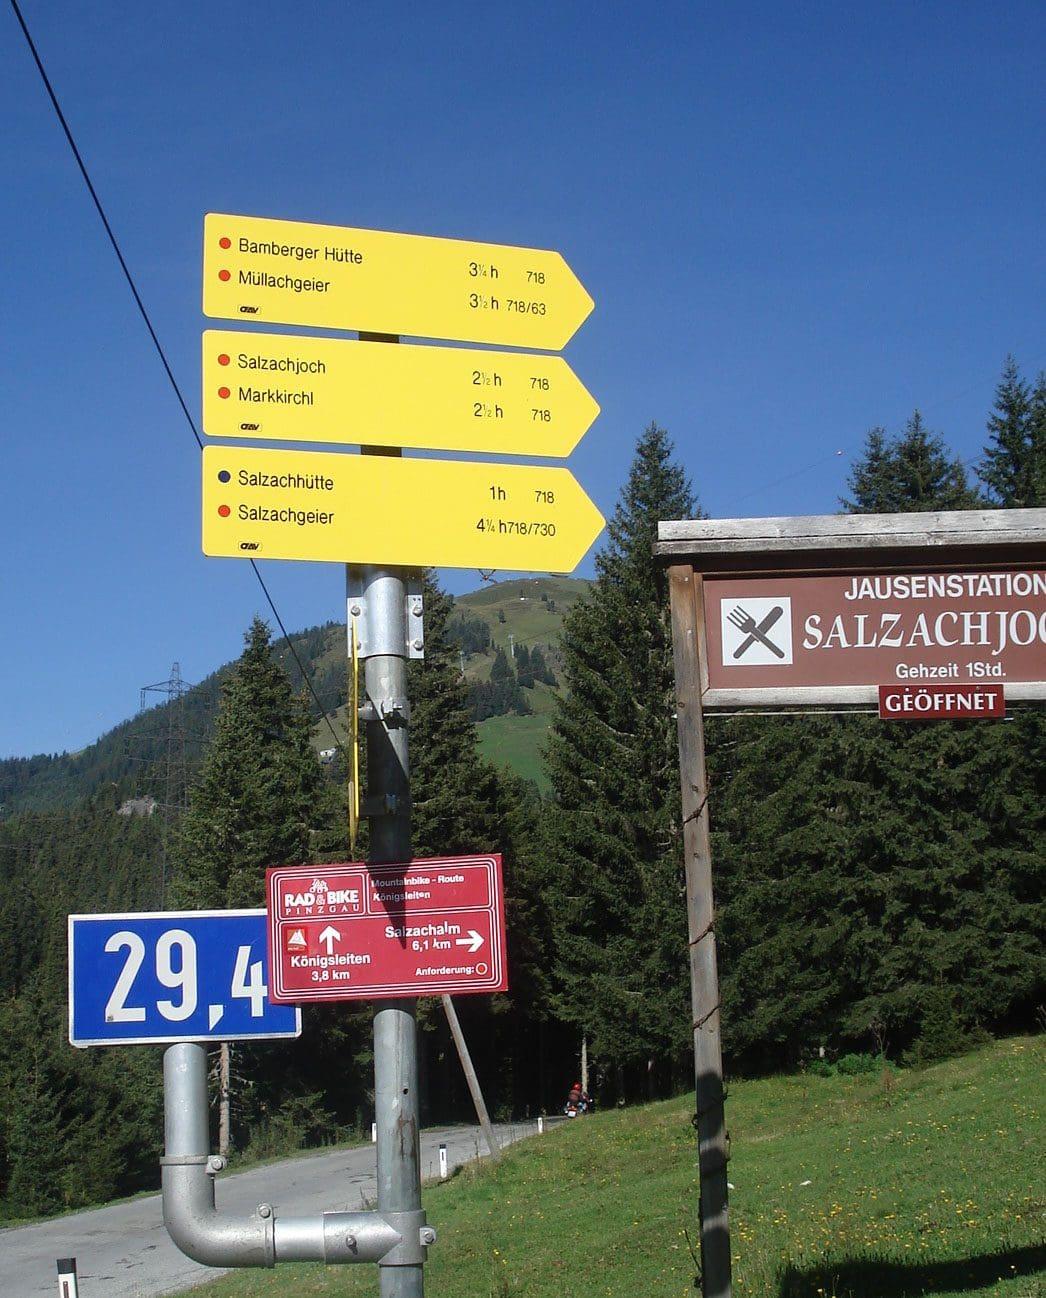 Salzachgeier_1